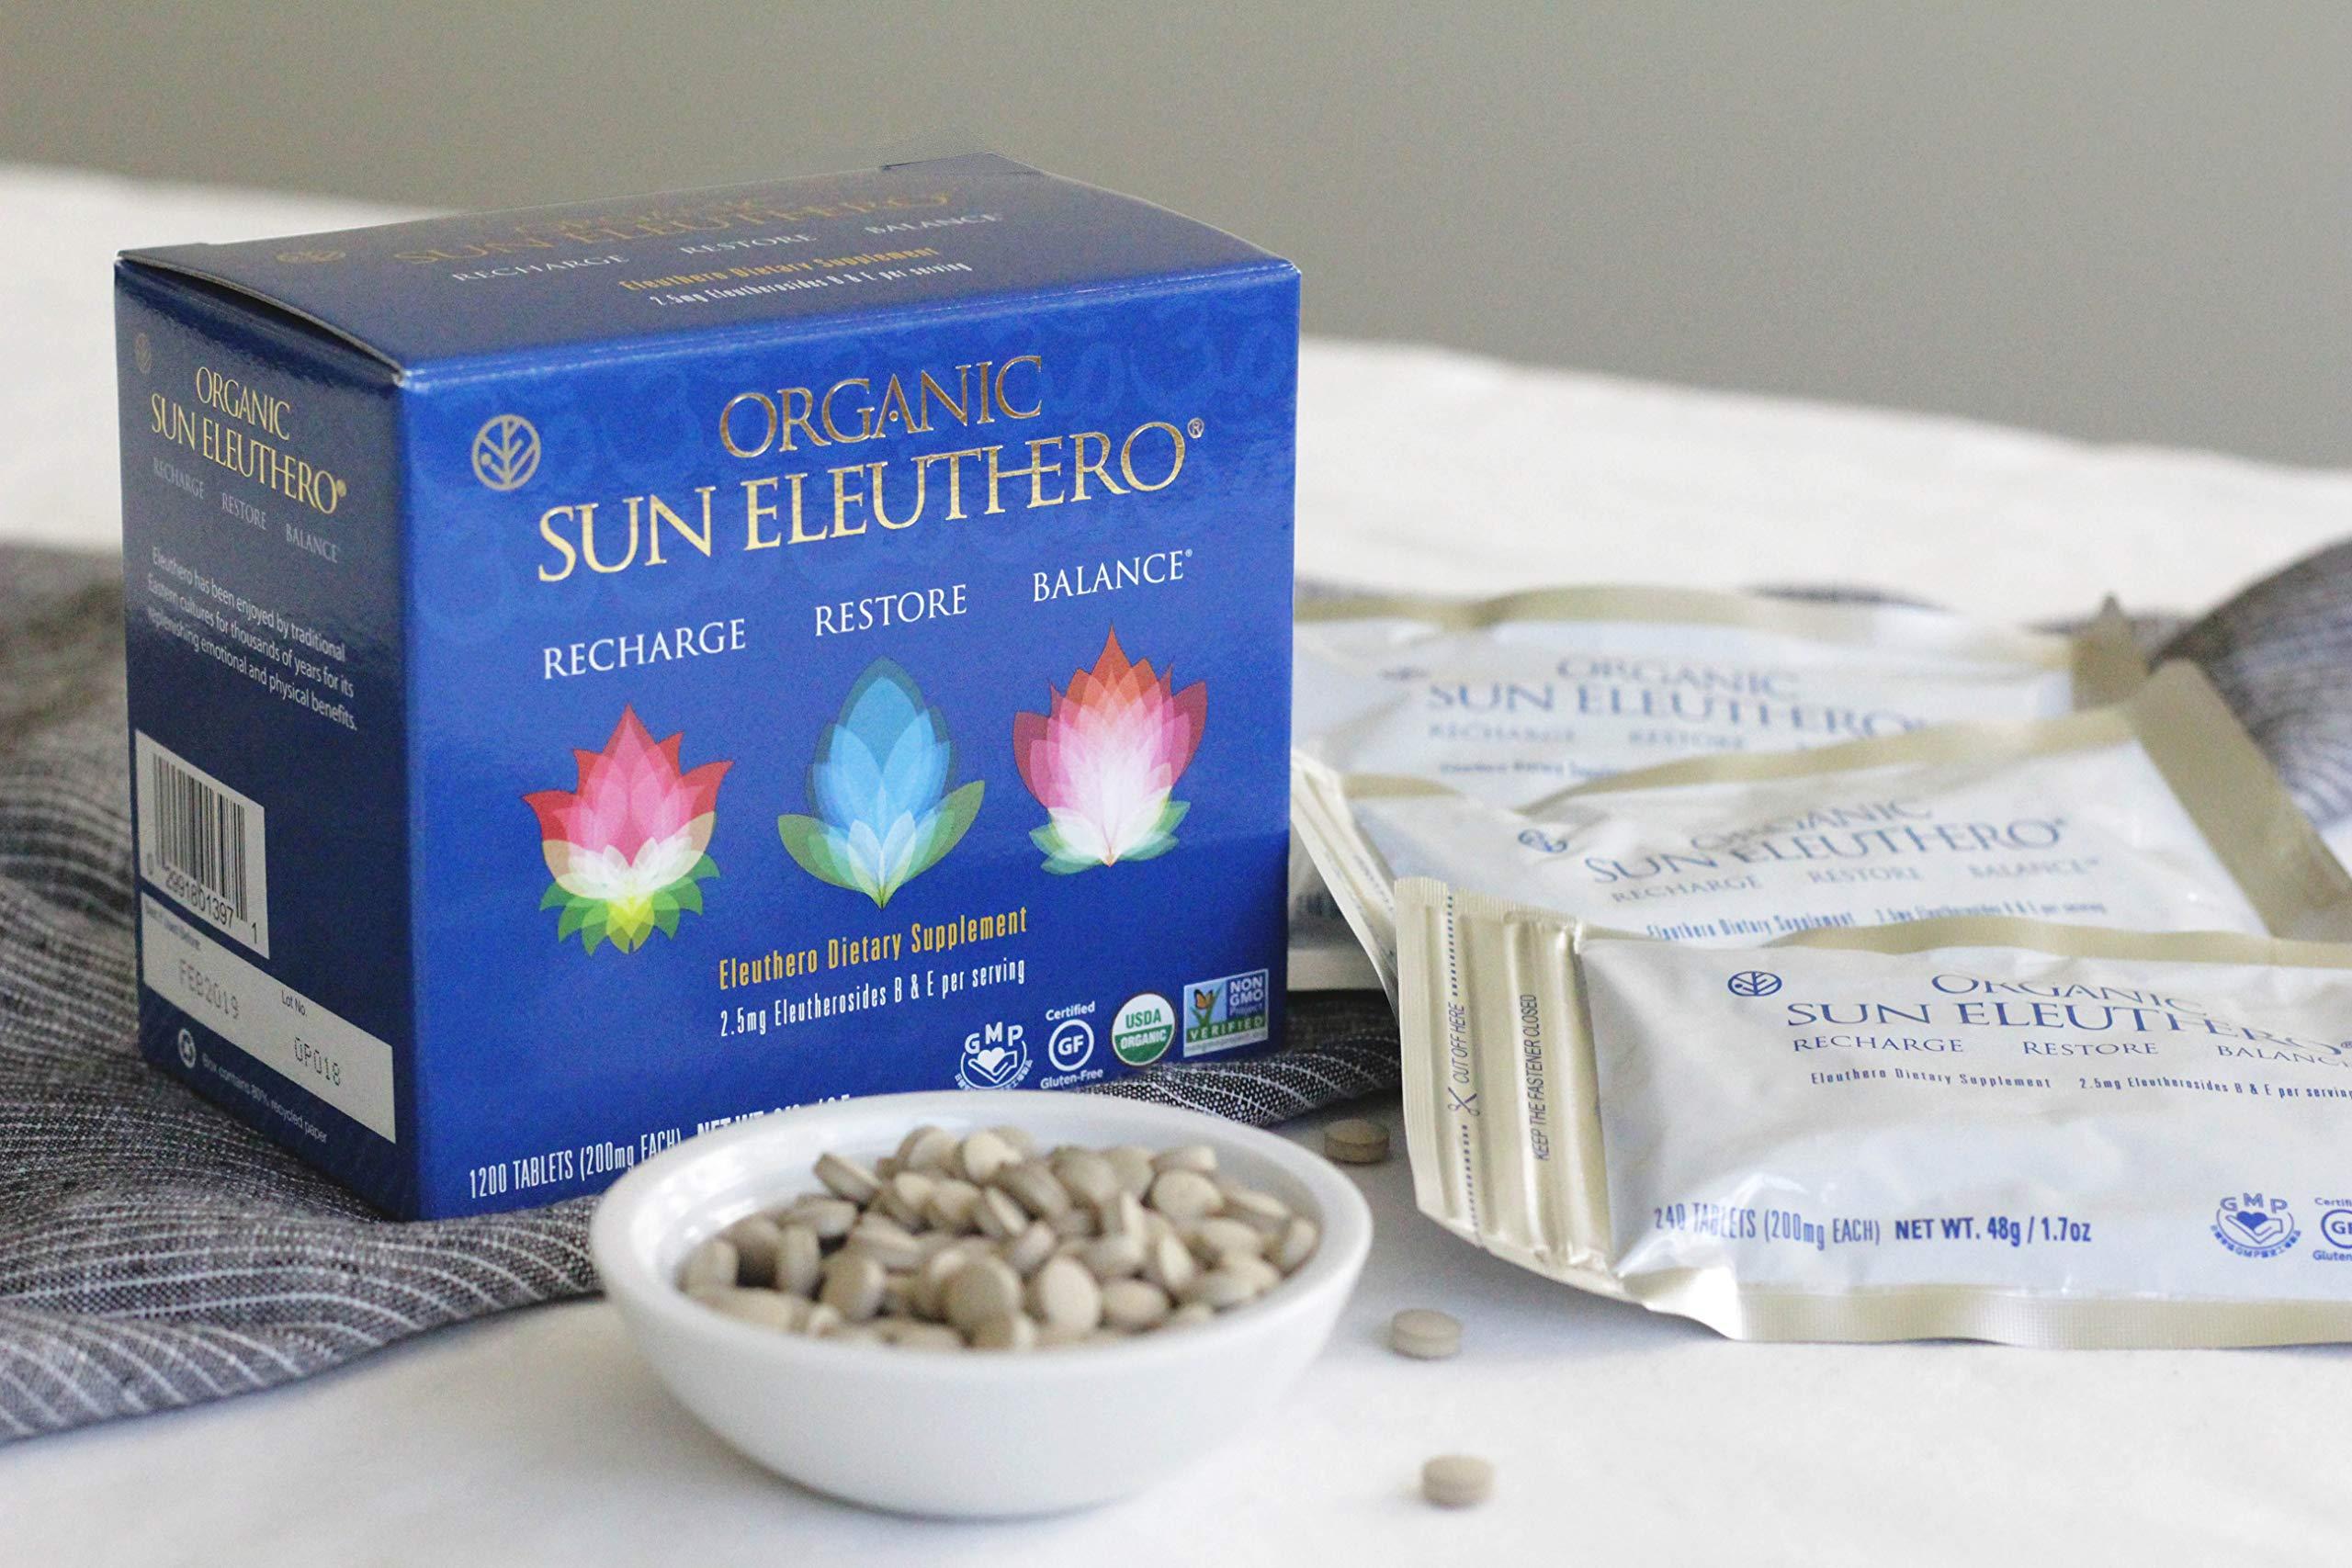 Sun Chlorella- Organic Sun Eleuthero Dietary Supplement- 200Mg Tablets (1200 Count) by Sun Chlorella (Image #5)